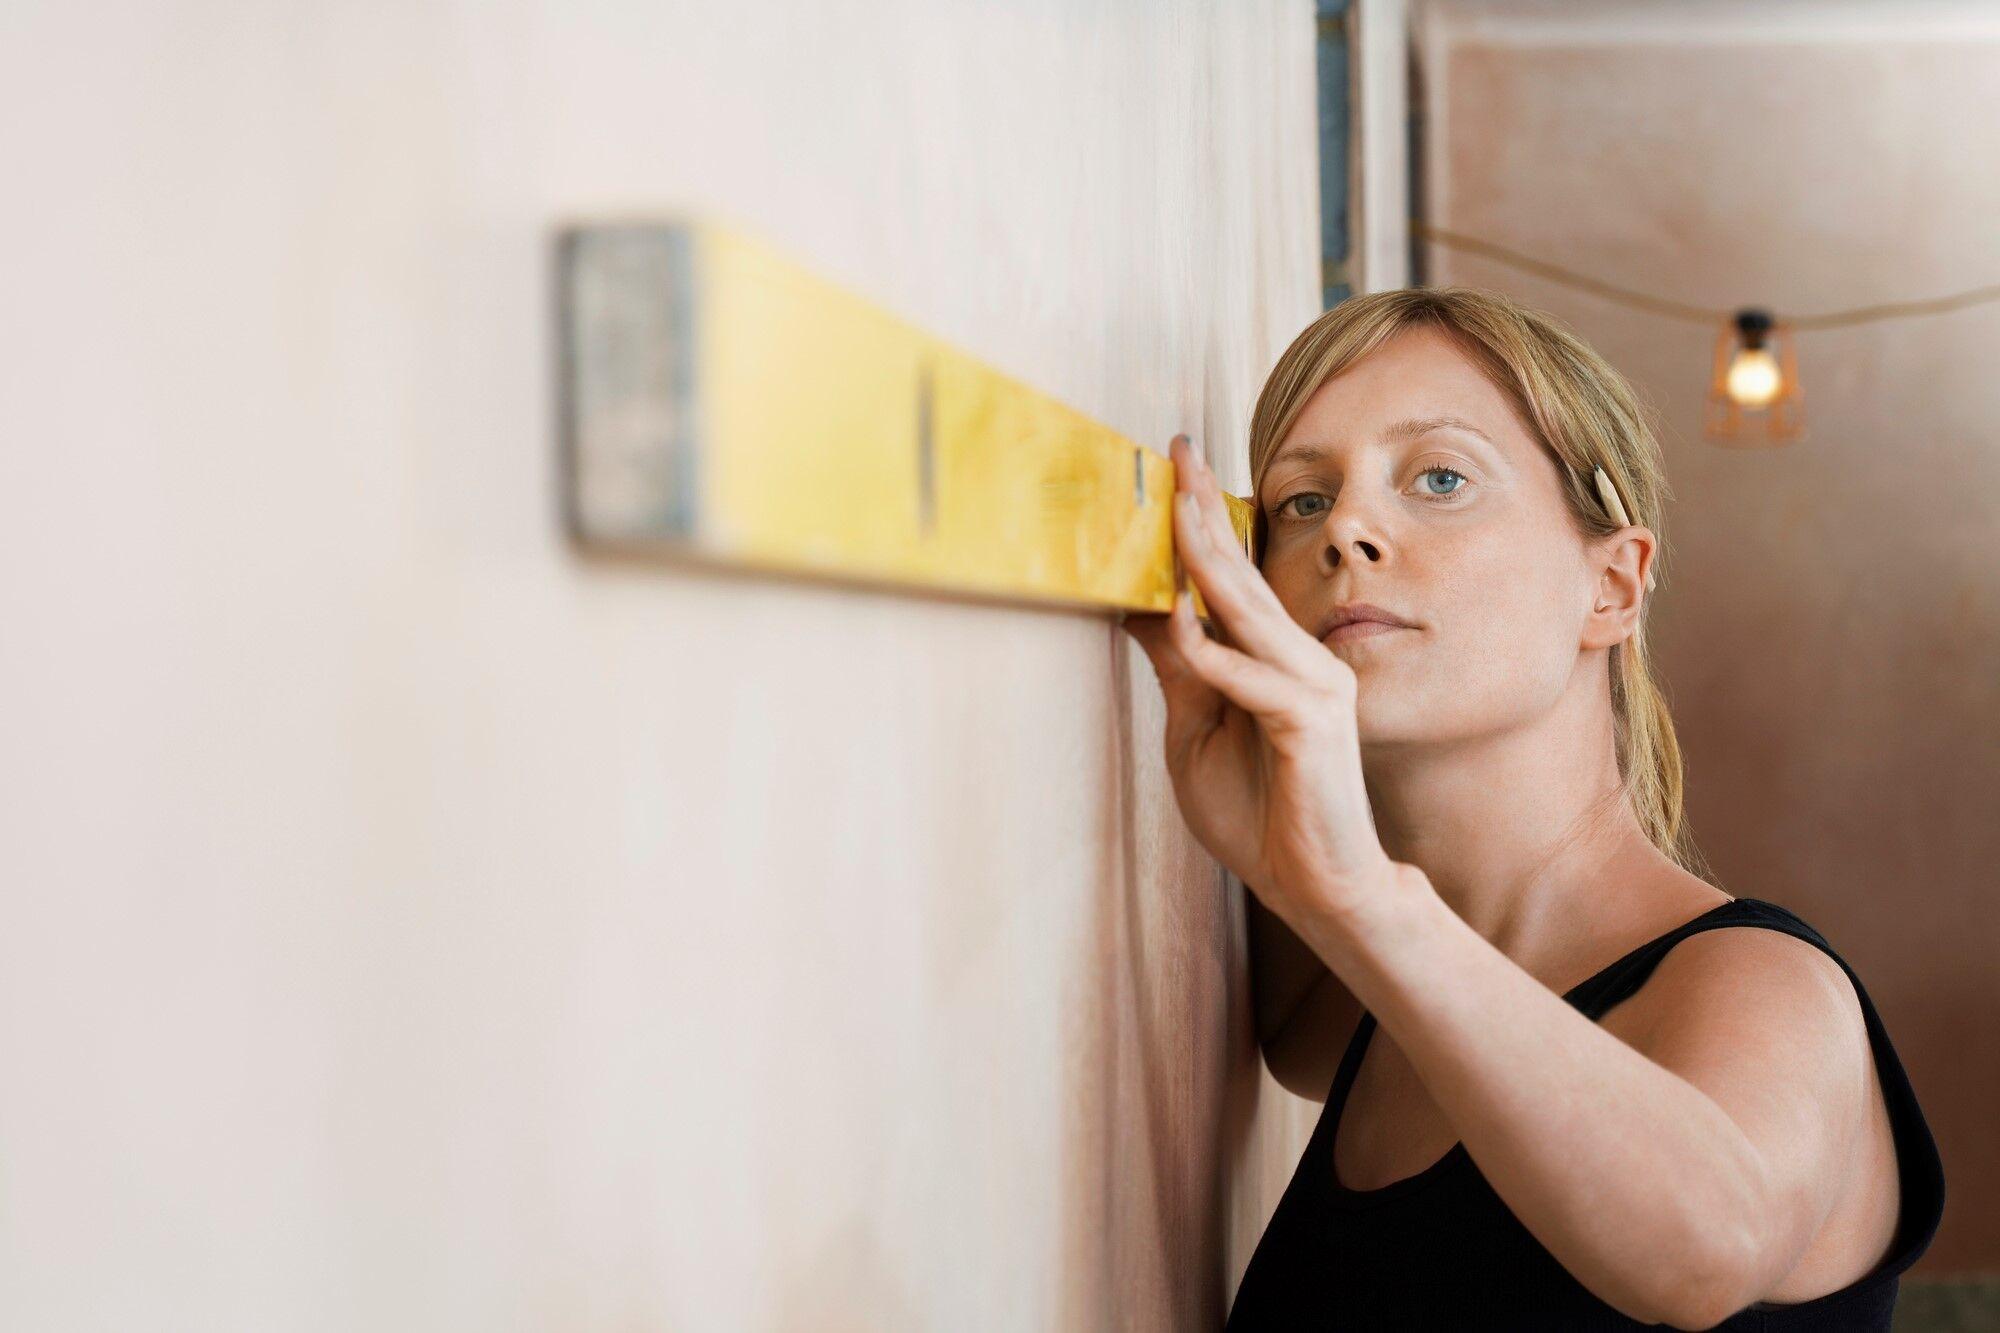 Квартира без сантехники: небрежность застройщика или норма?